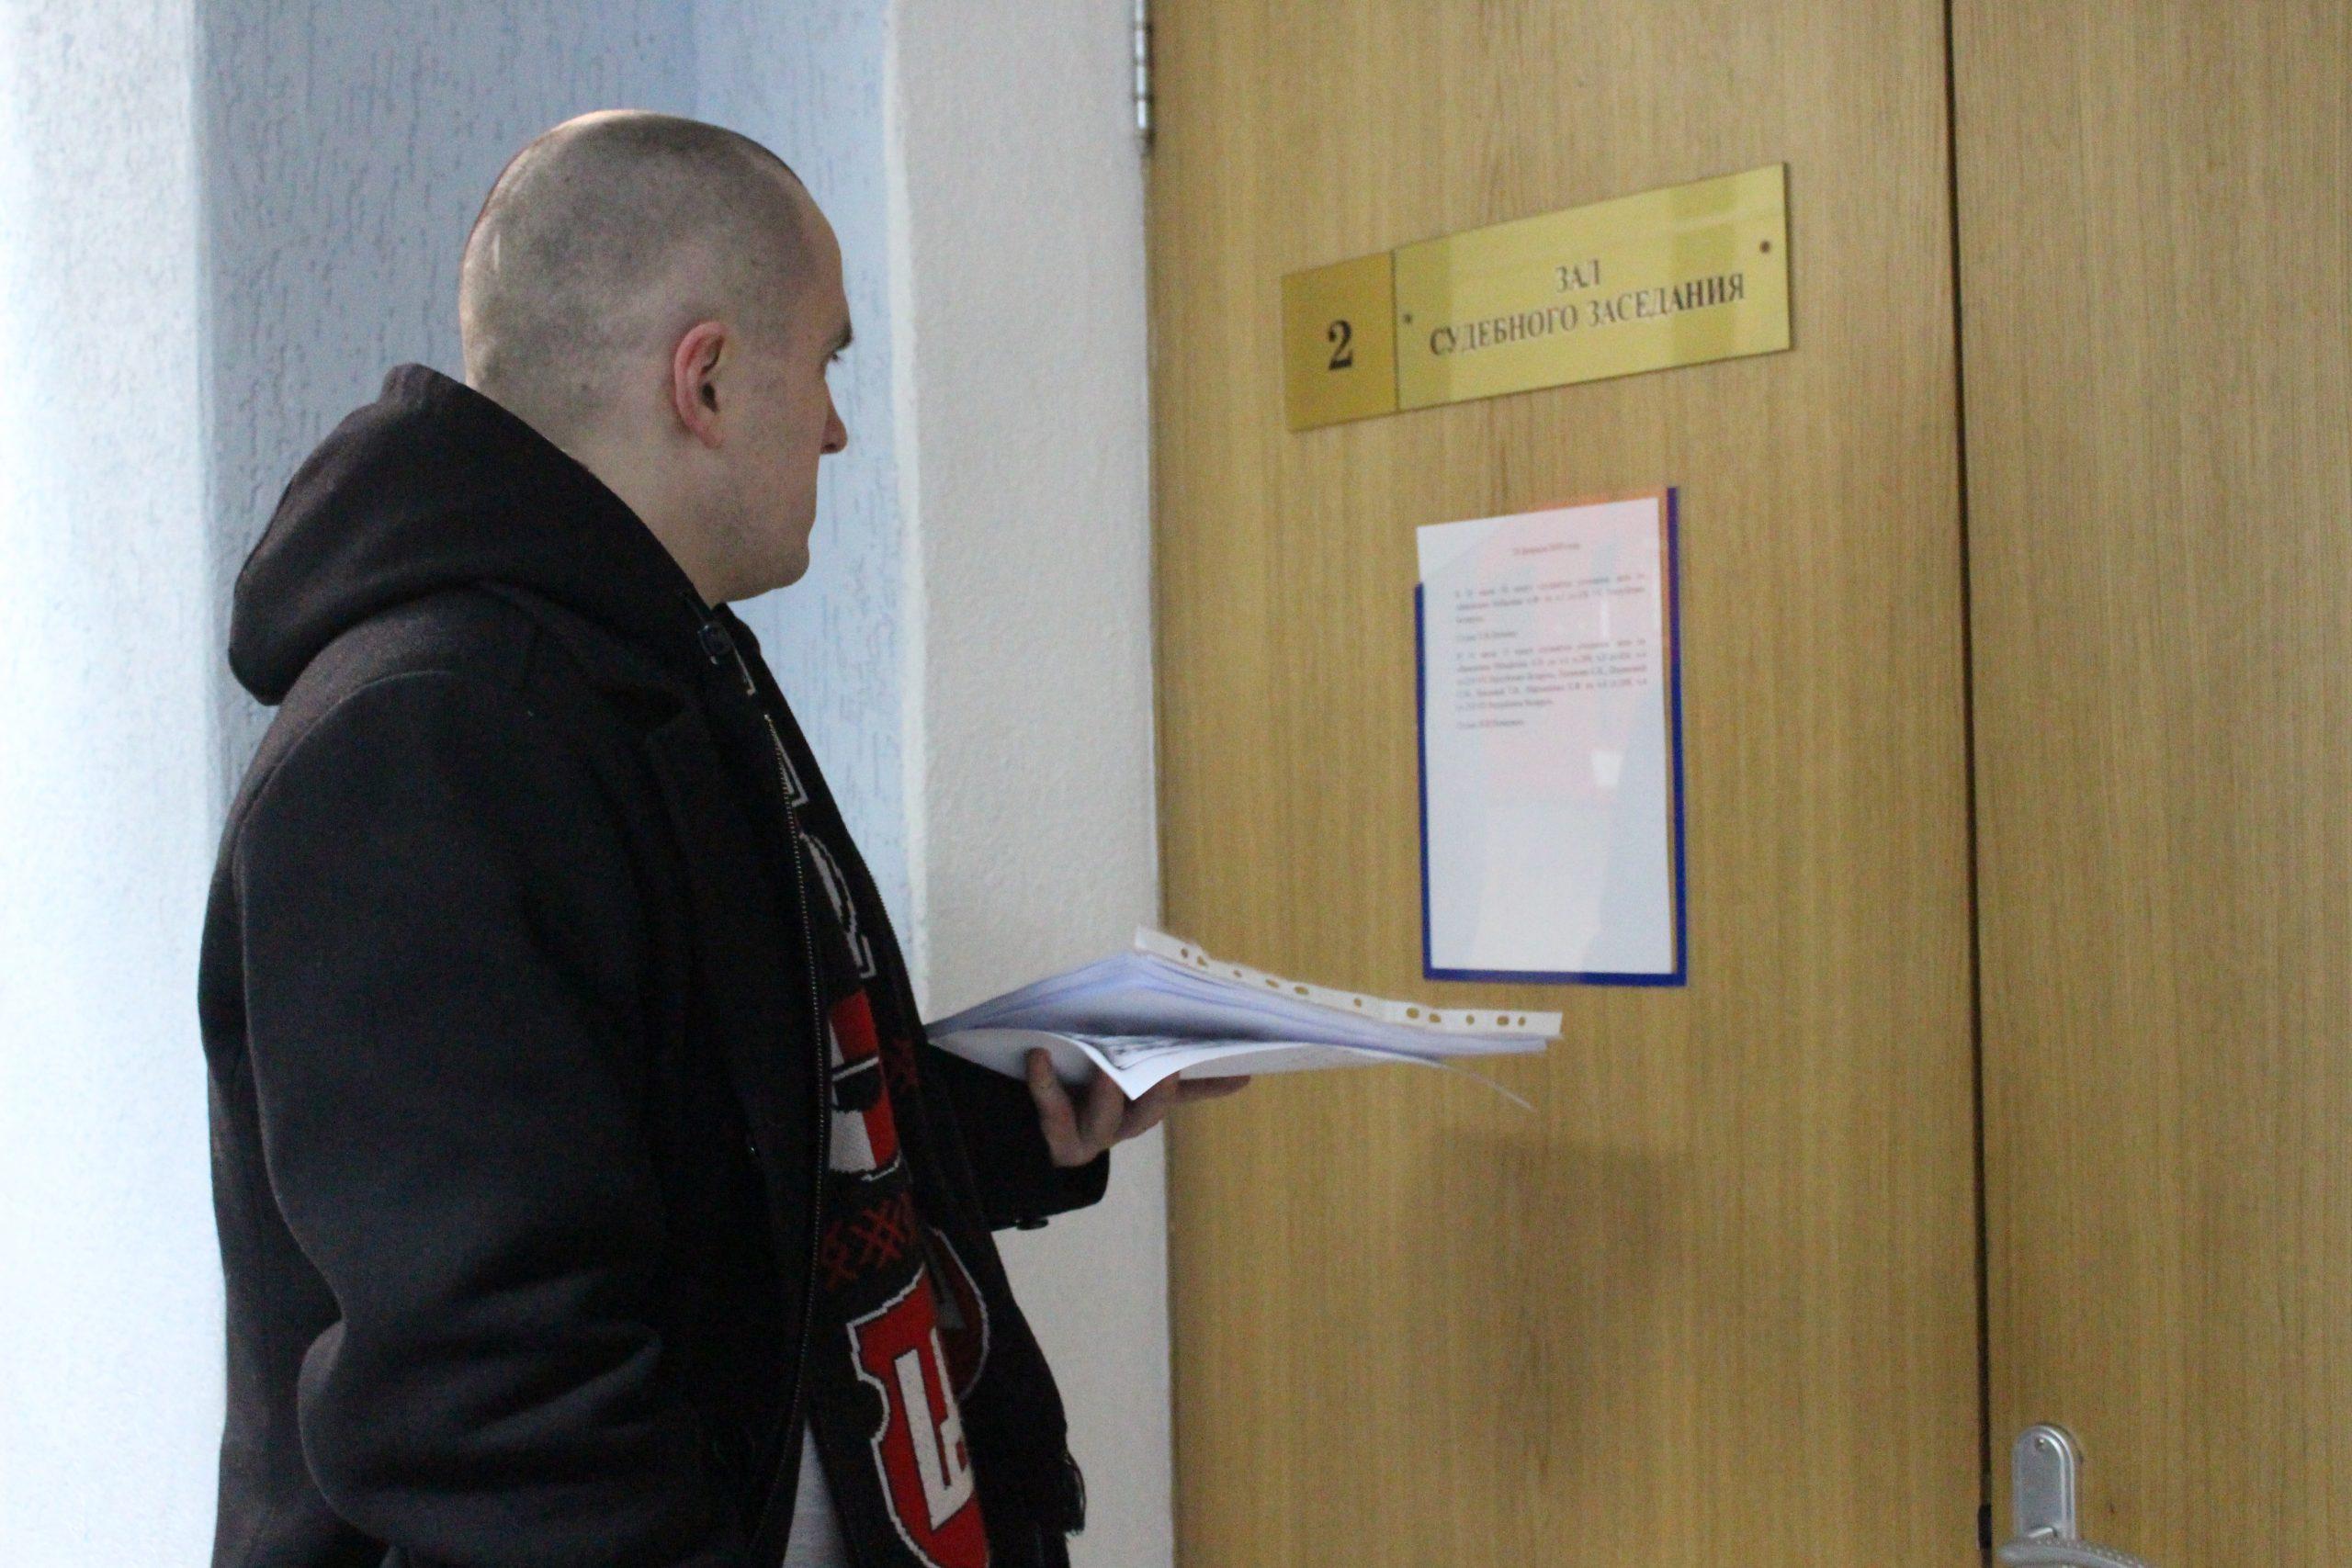 На могилевского активиста Станислава Павлинковича завели уголовное дело за оскорбление судьи ФОТО